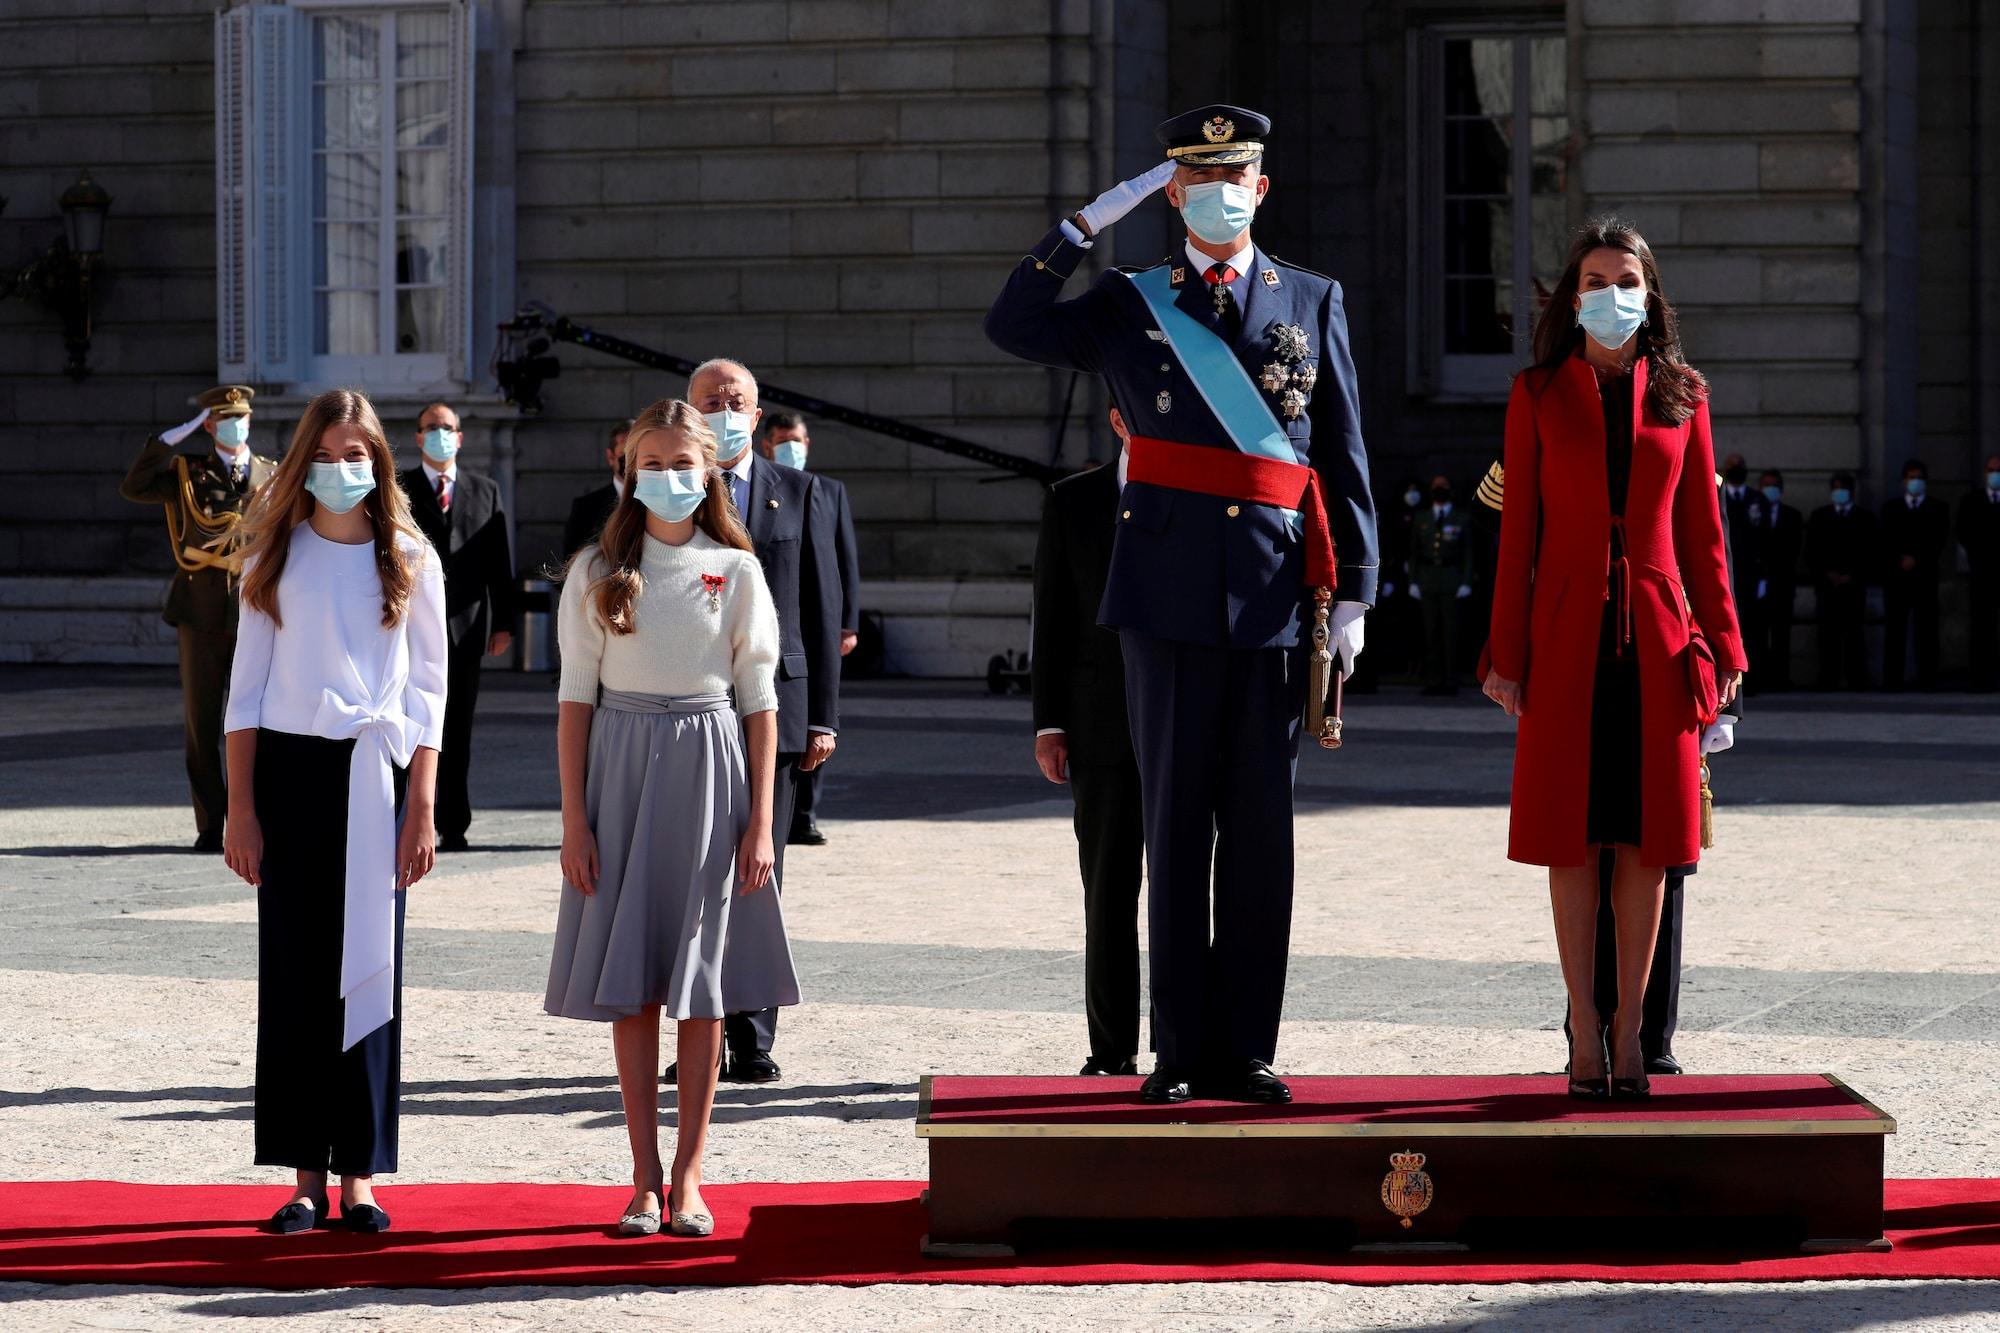 Spanish King Felipe, Queen Letizia, Princess Leonor and Infanta Sofia